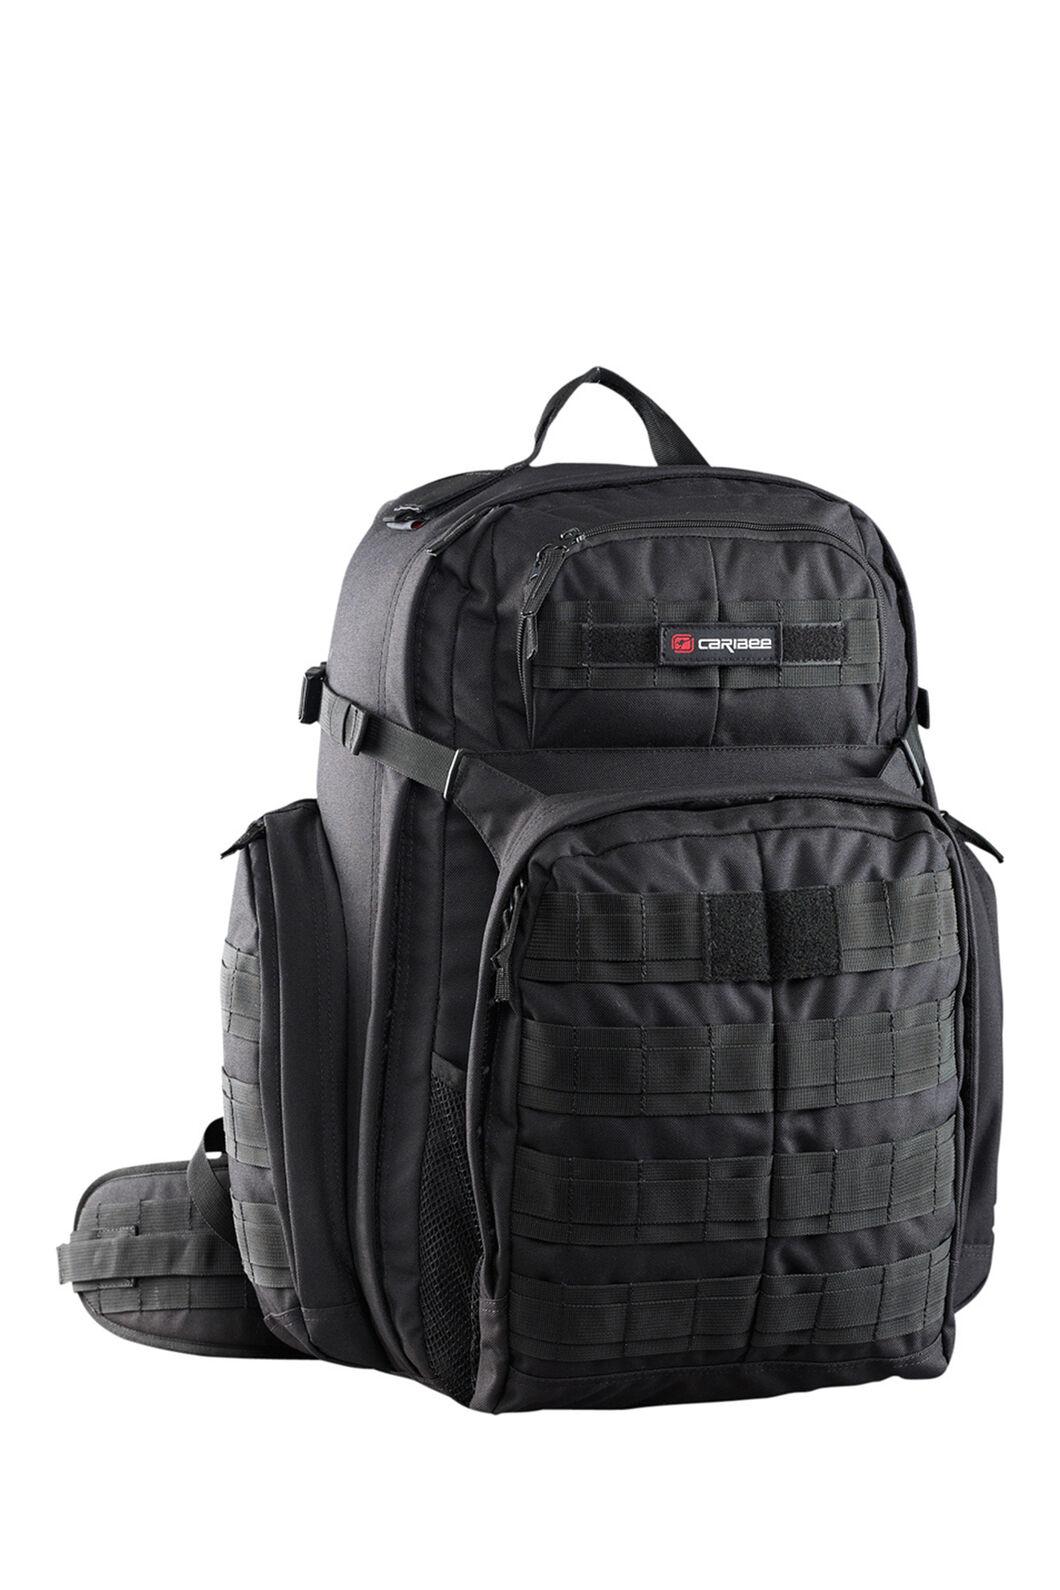 Caribee Ops 50L Day Pack, Black, hi-res